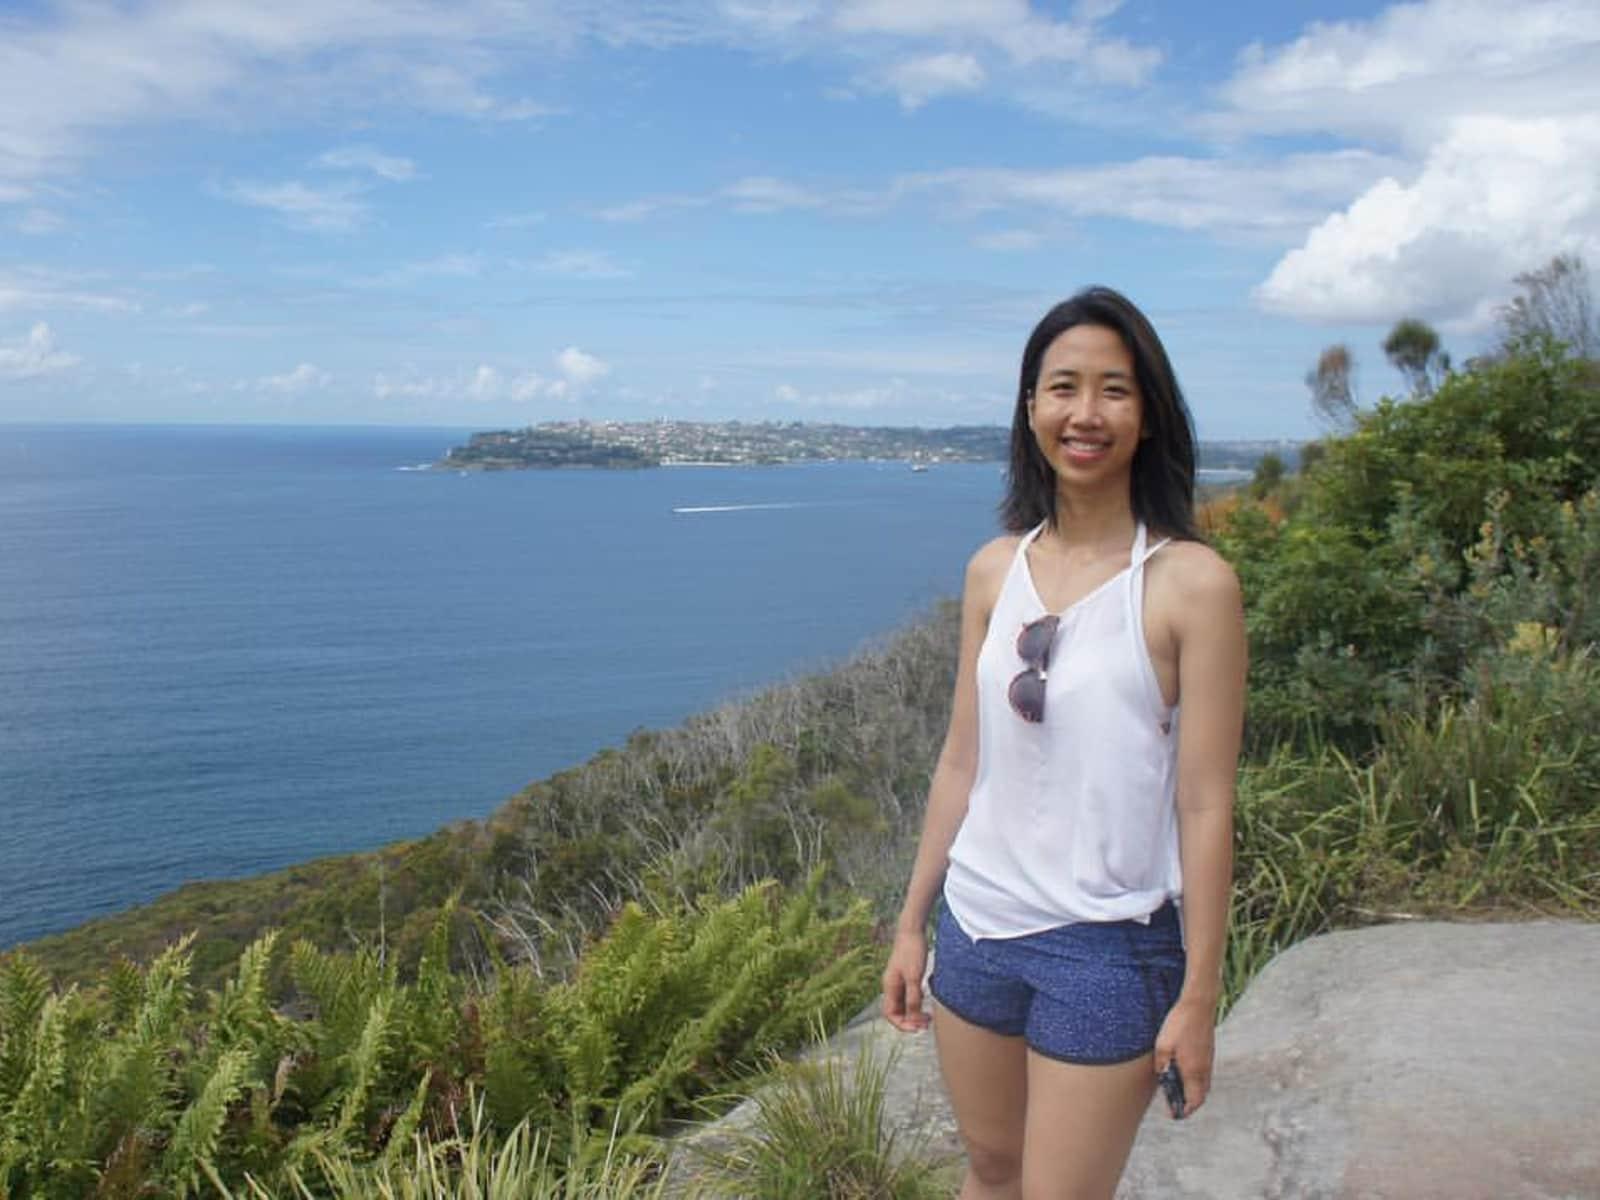 Haymon from Sydney, New South Wales, Australia